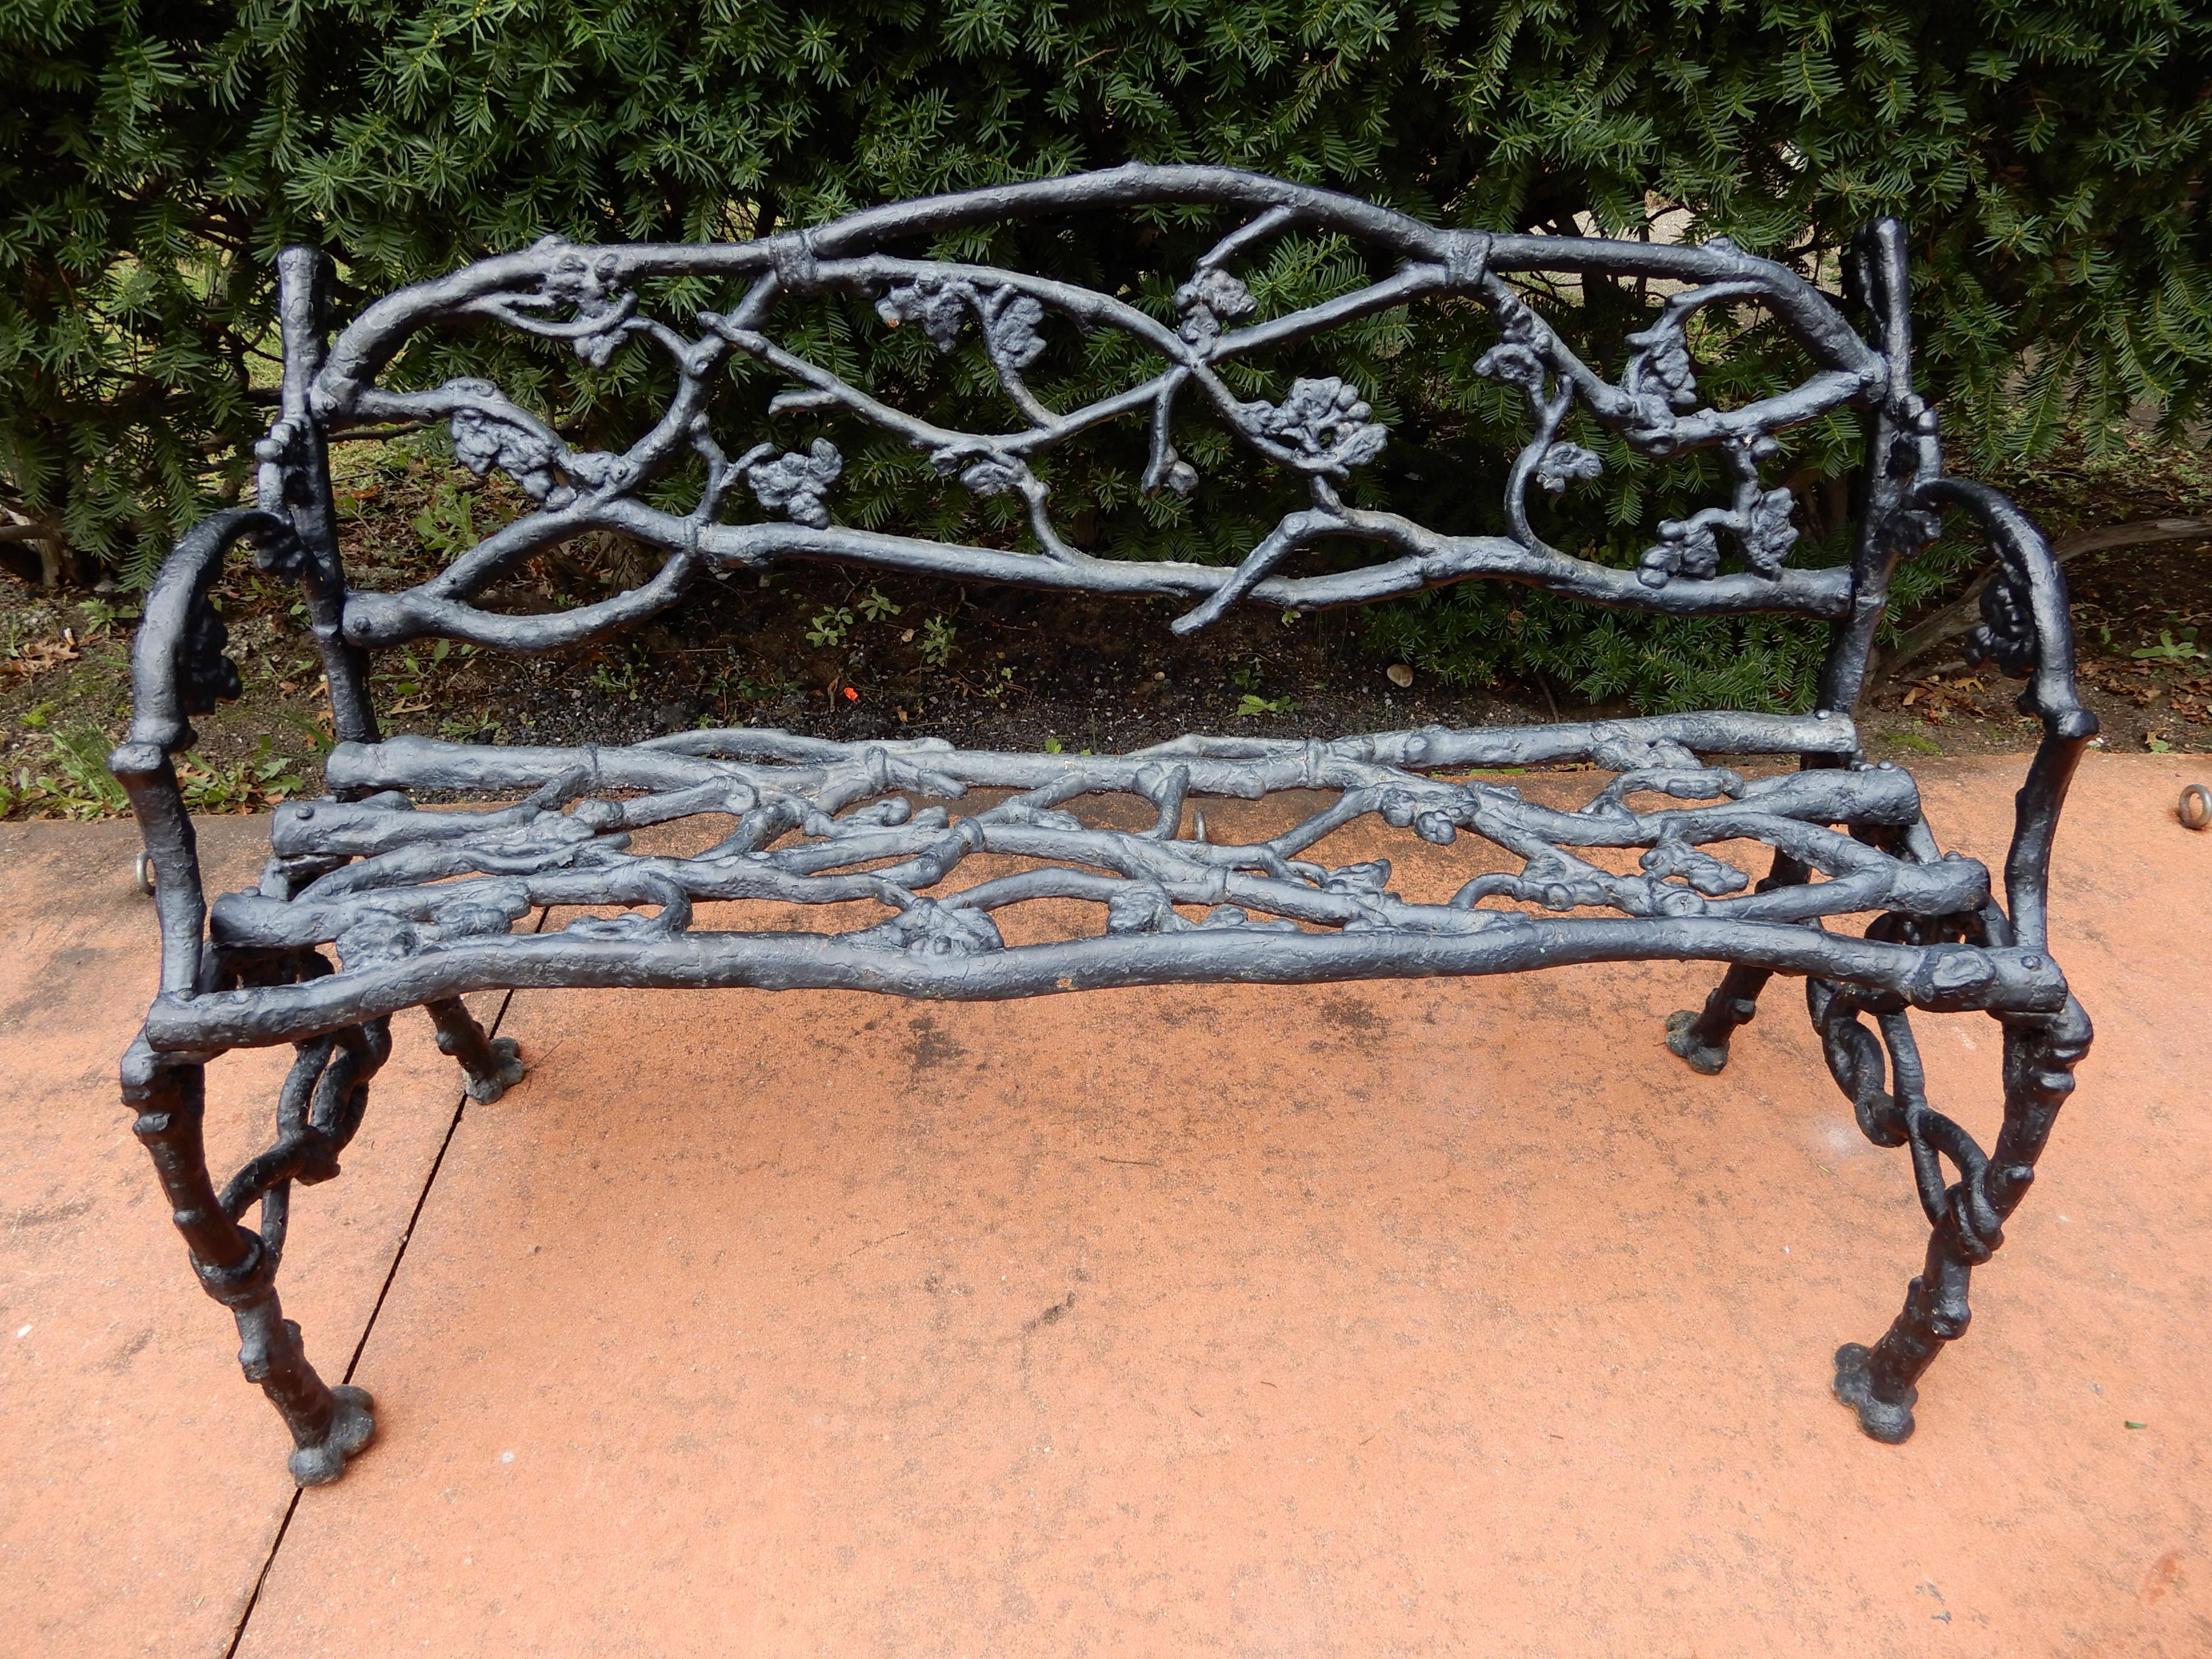 Garden Antique Rustic Or Twig Cast Iron Bench U0026 Chair